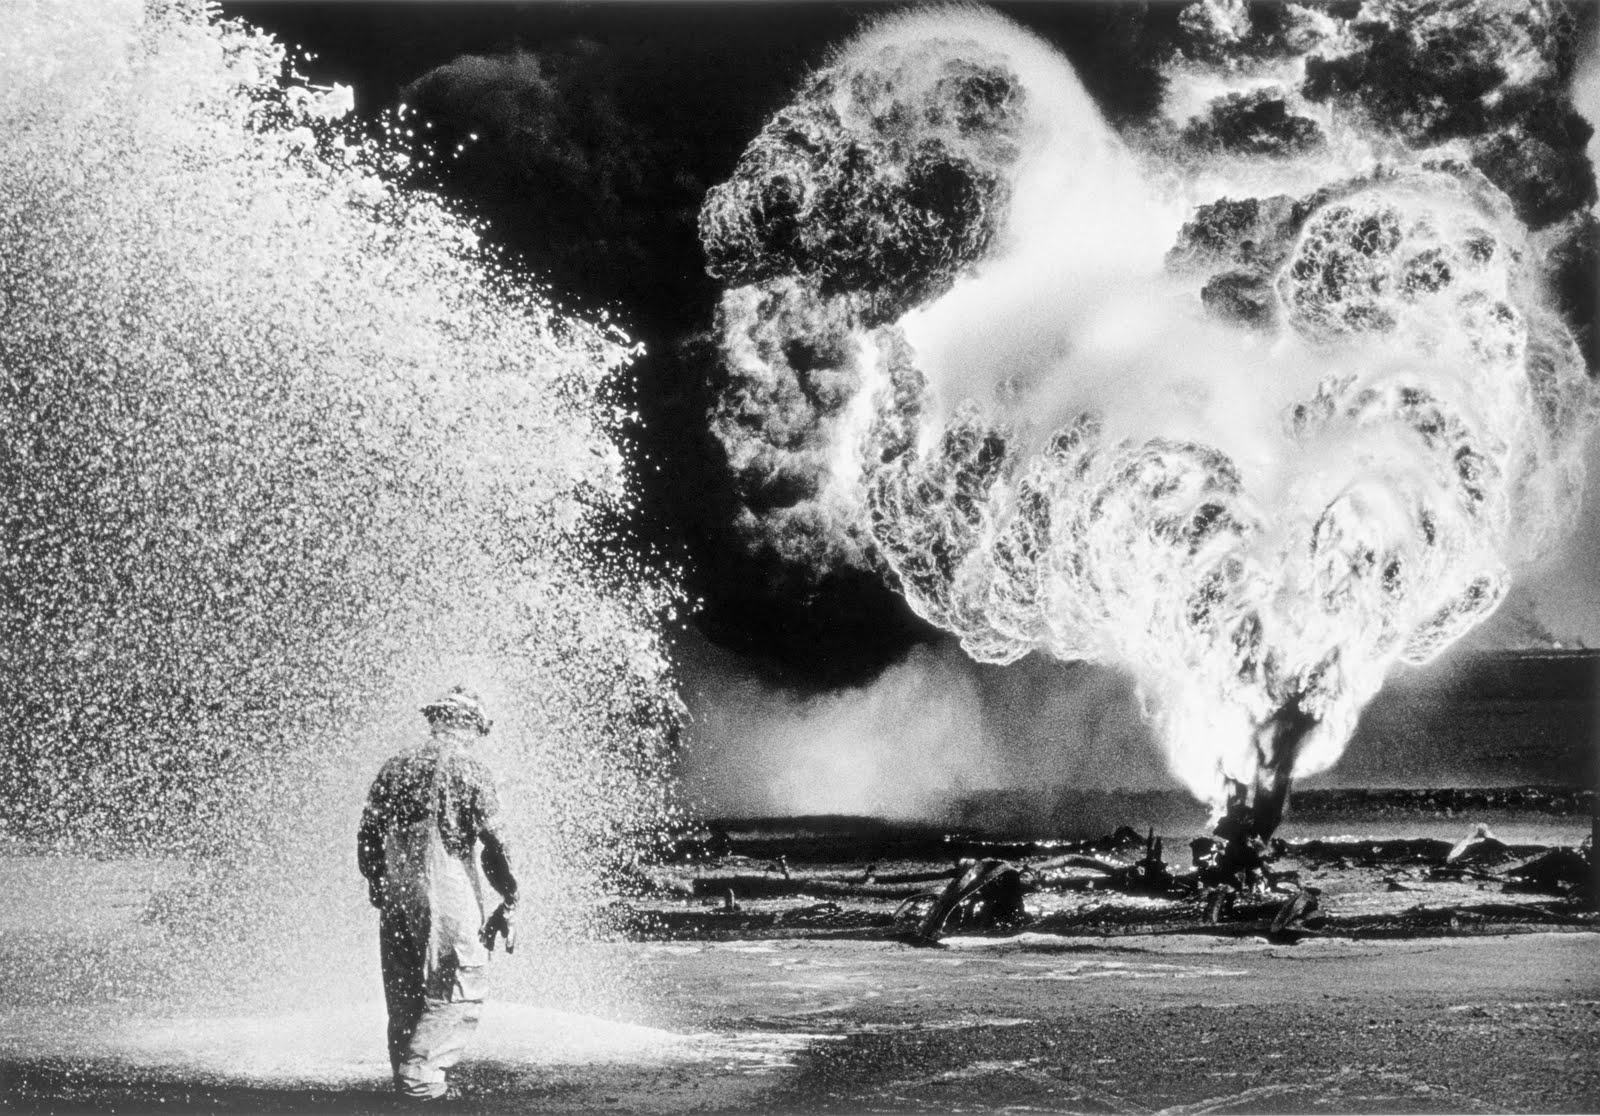 Oil fire in Kuwait, 1991. Photograph by Sebastião Salgado.